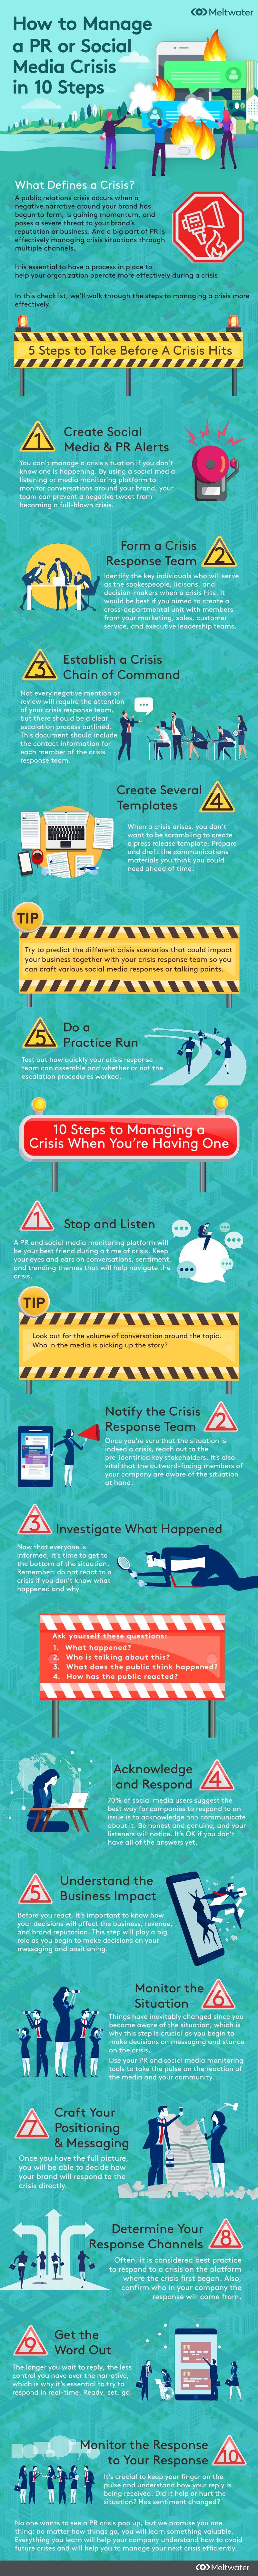 PR or Social Media Crisis Infographic